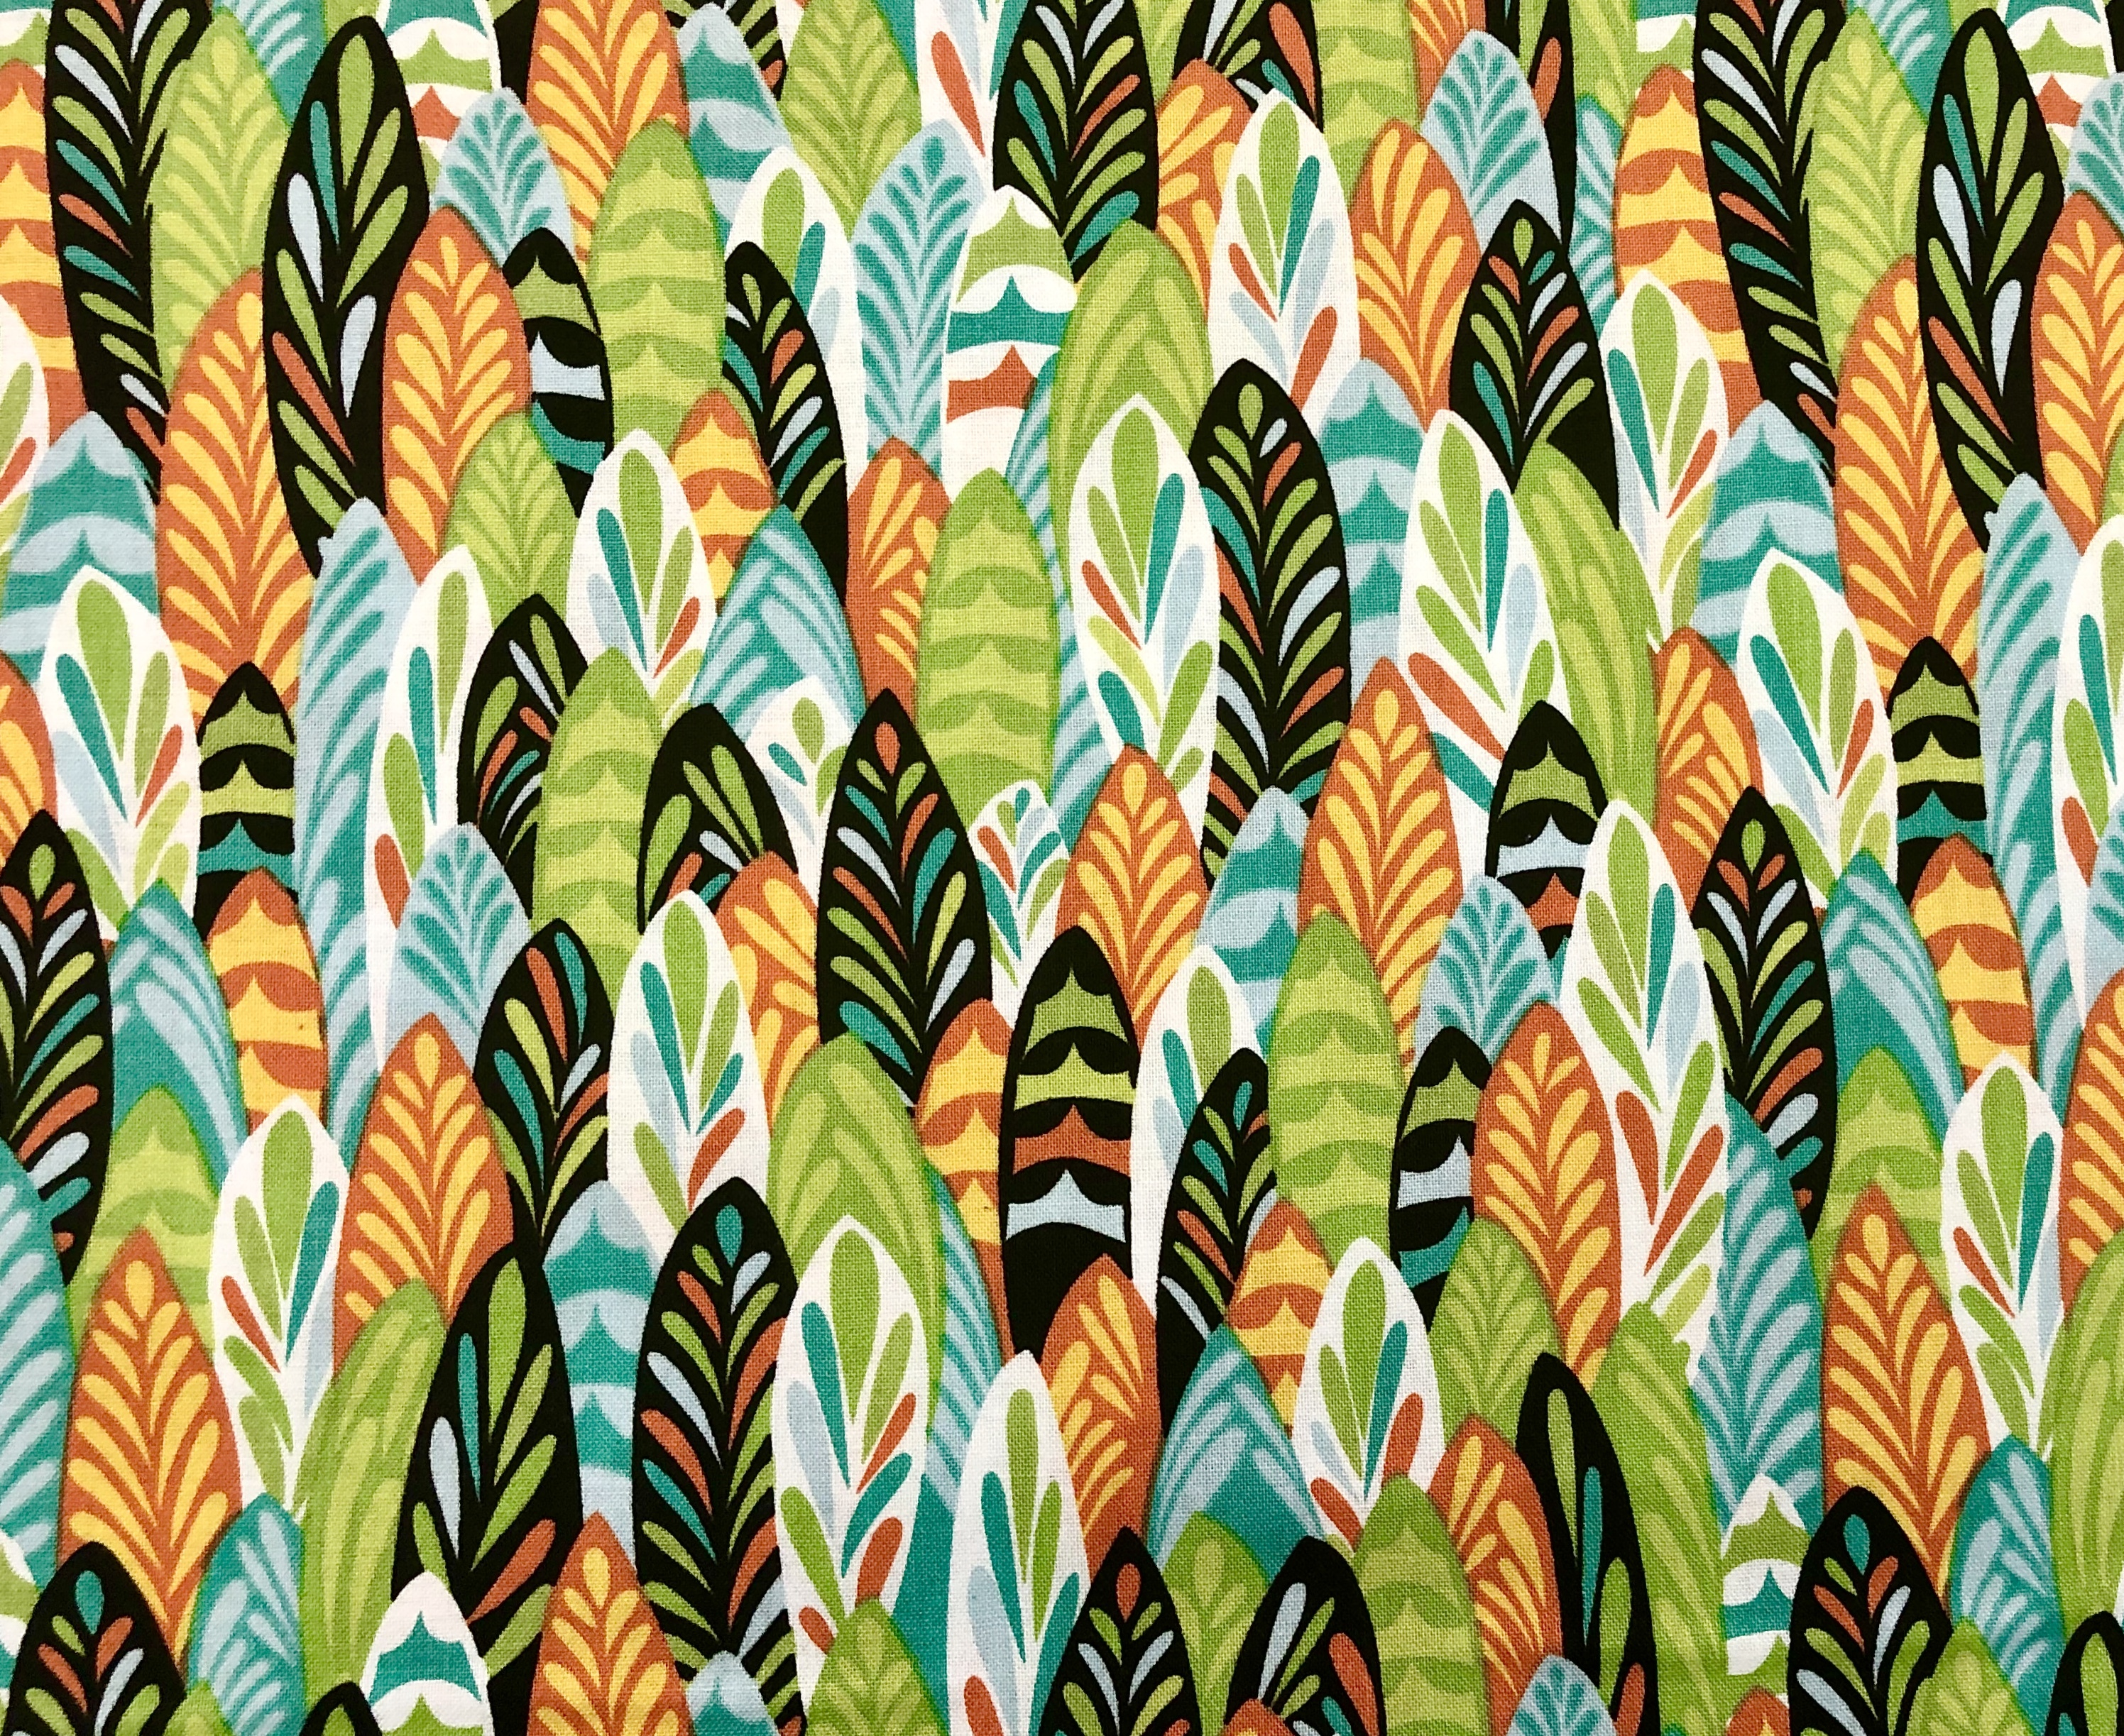 Feathers & Foliage - Wilmington Fabrics - 1/2m cut 55449